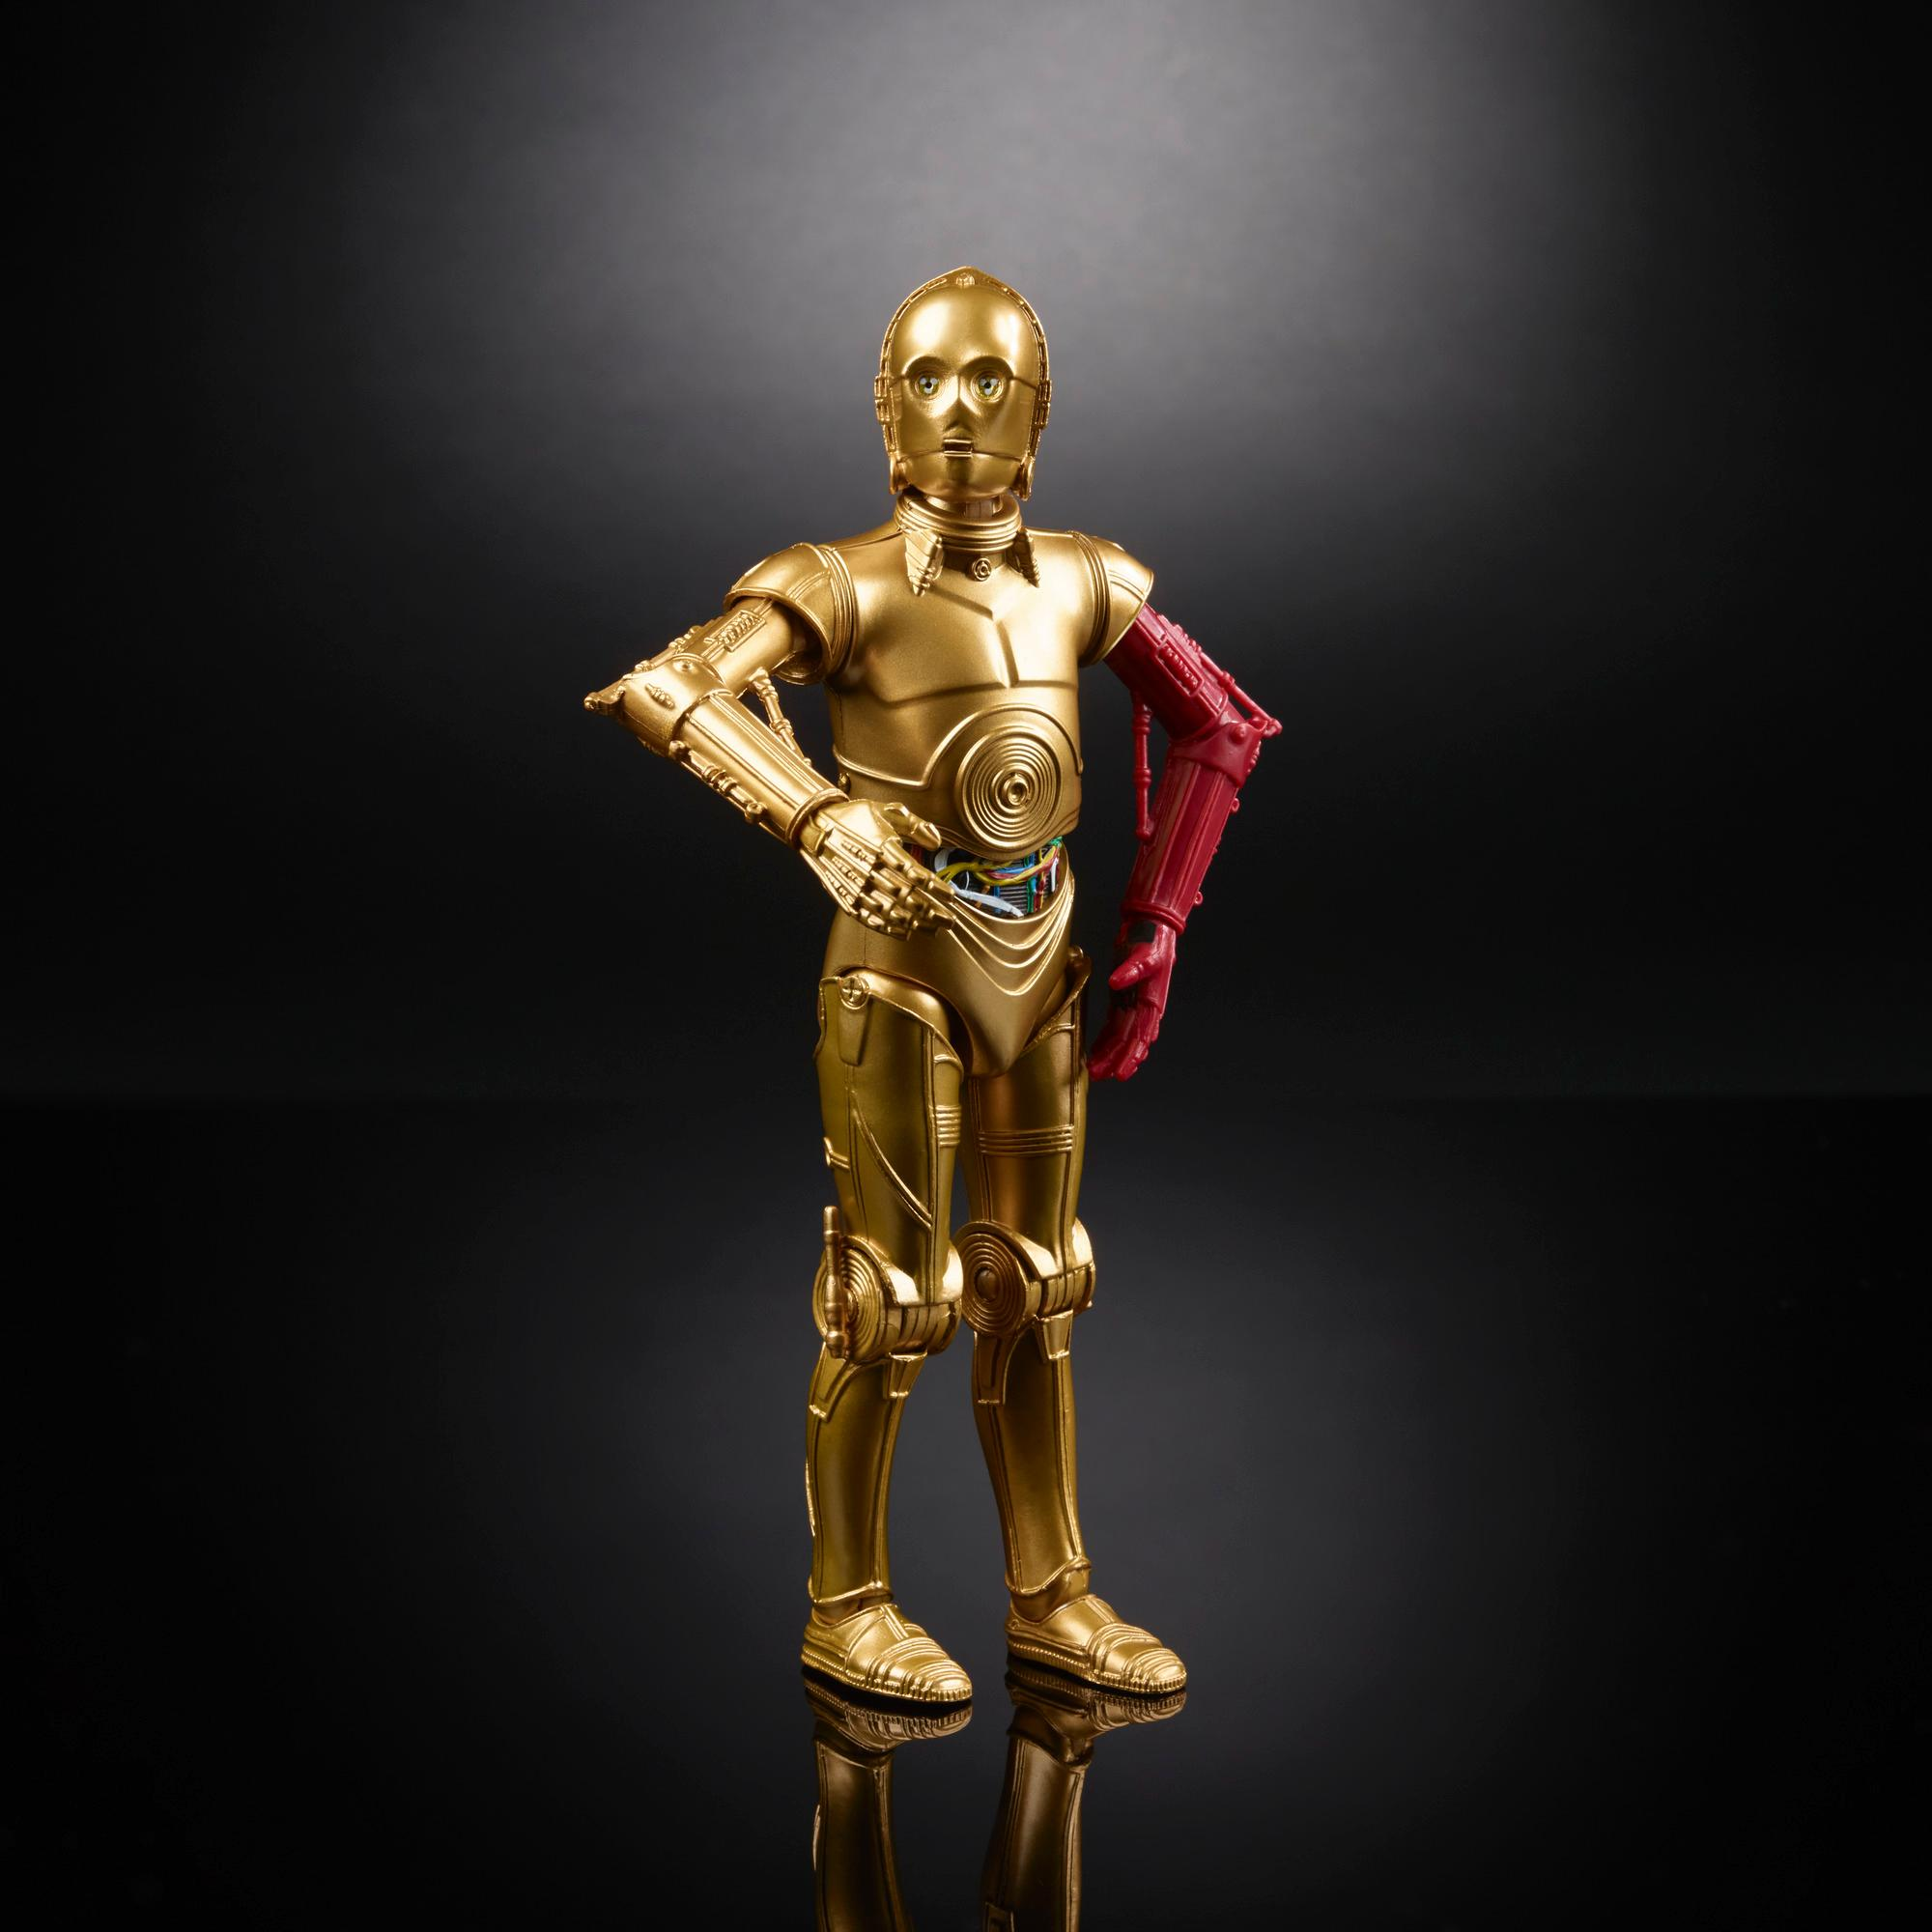 Star Wars The Black Series C-3PO